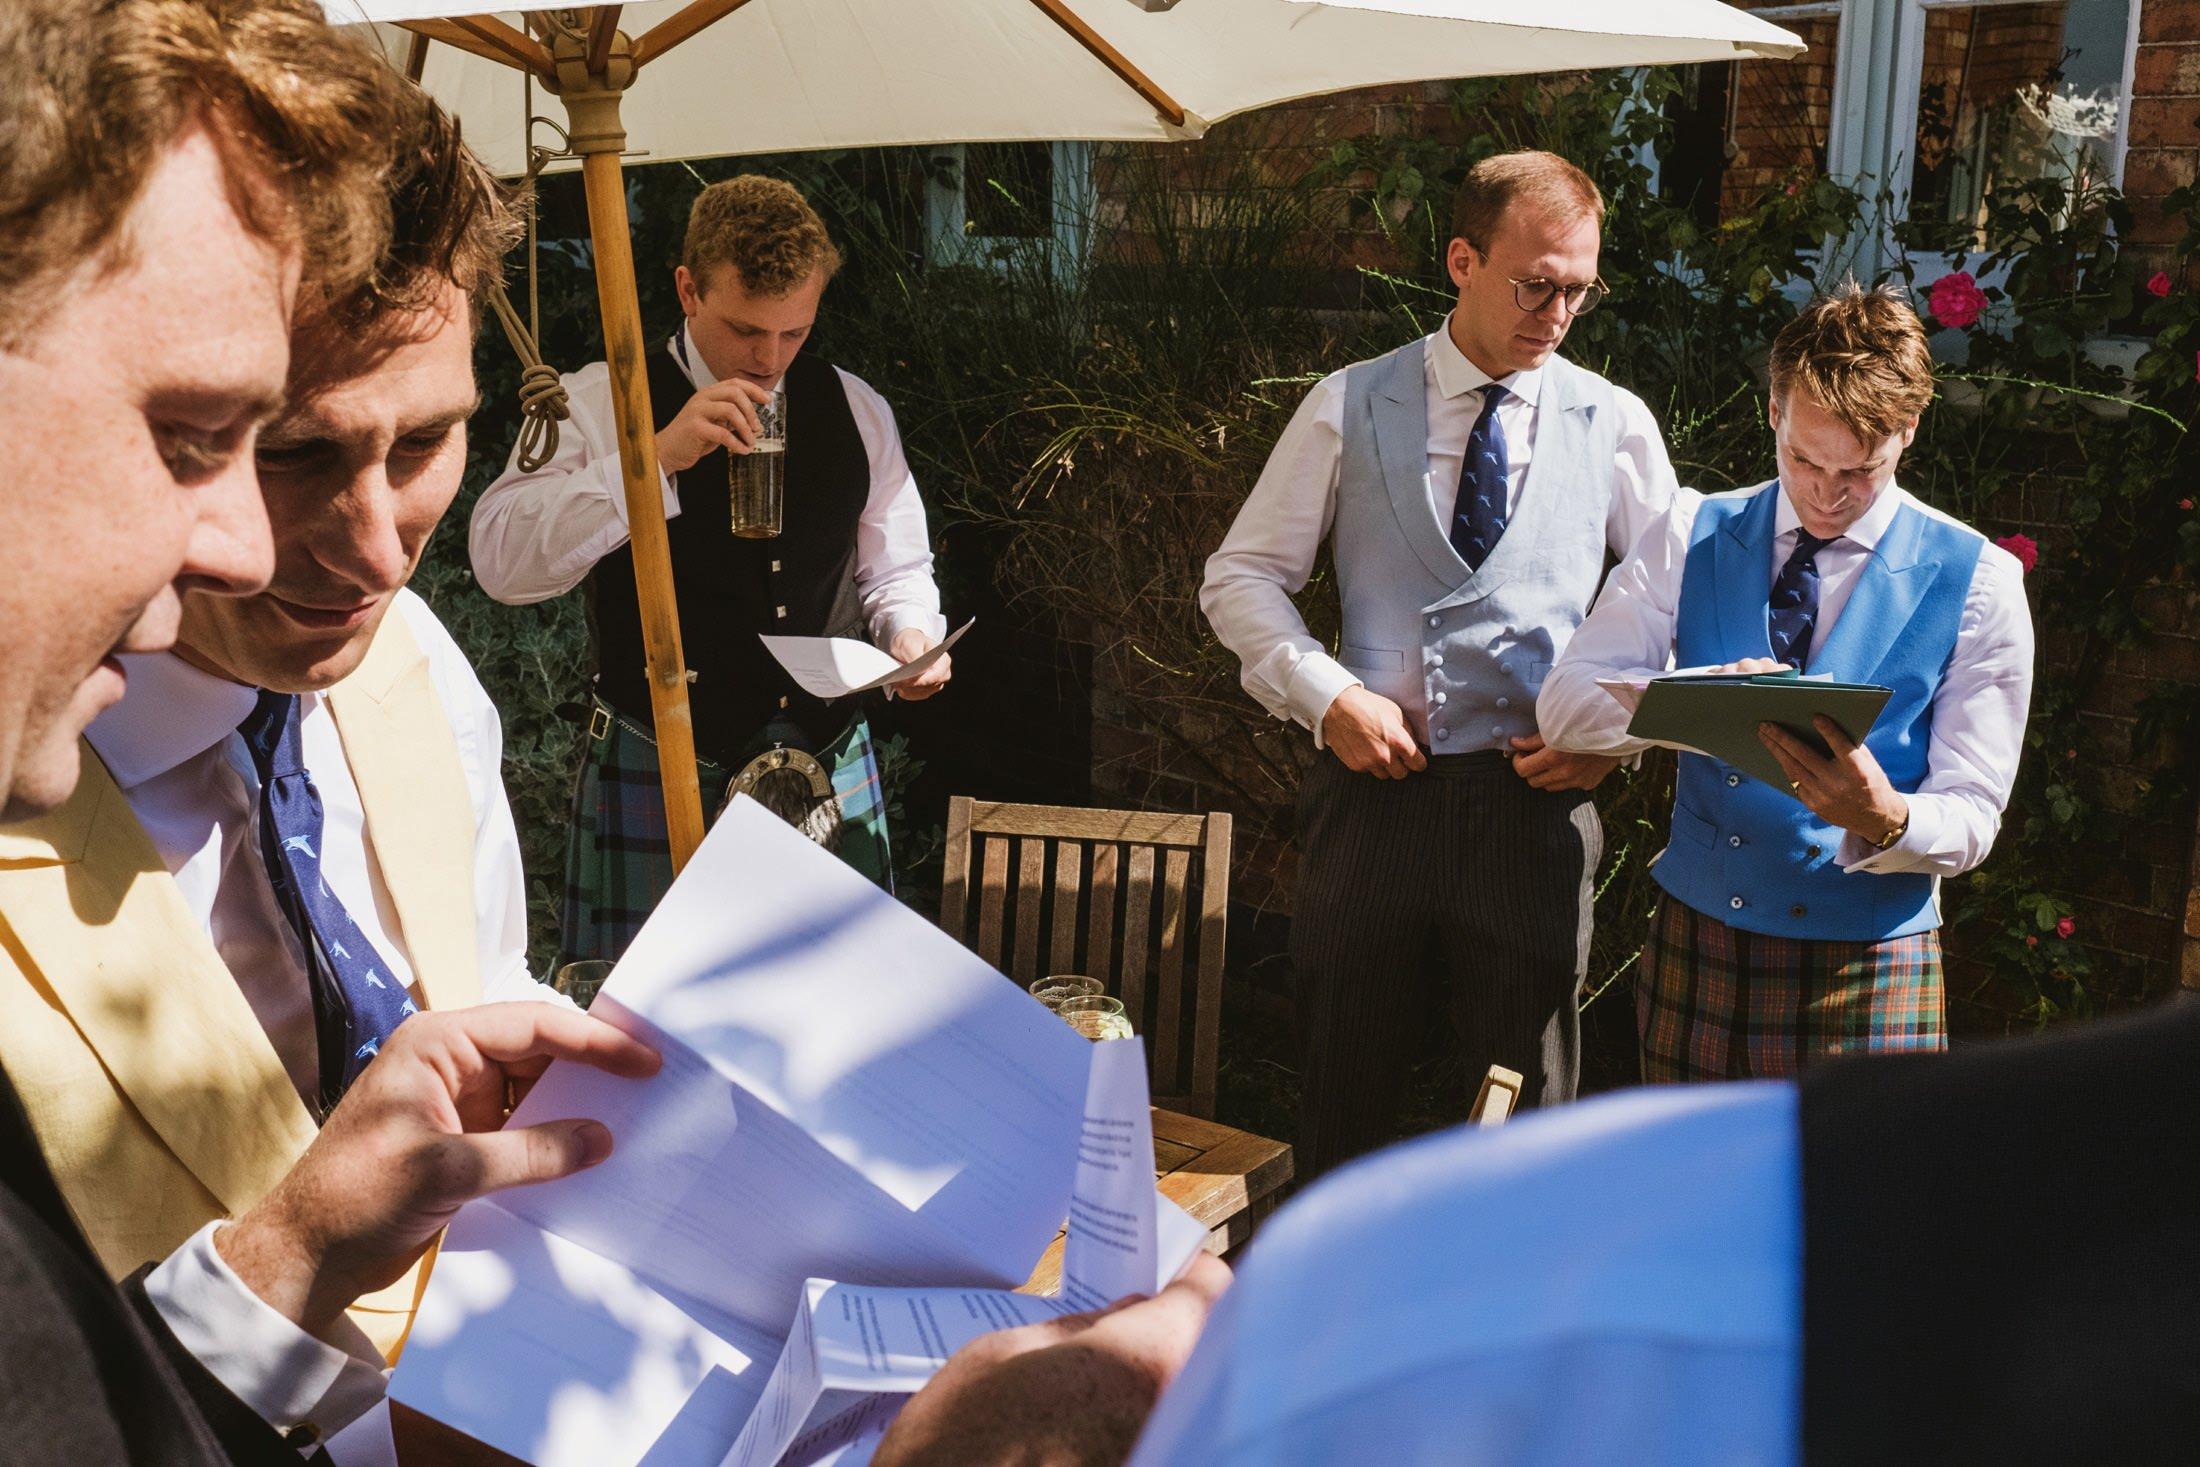 groomsmen and groom checking schedule